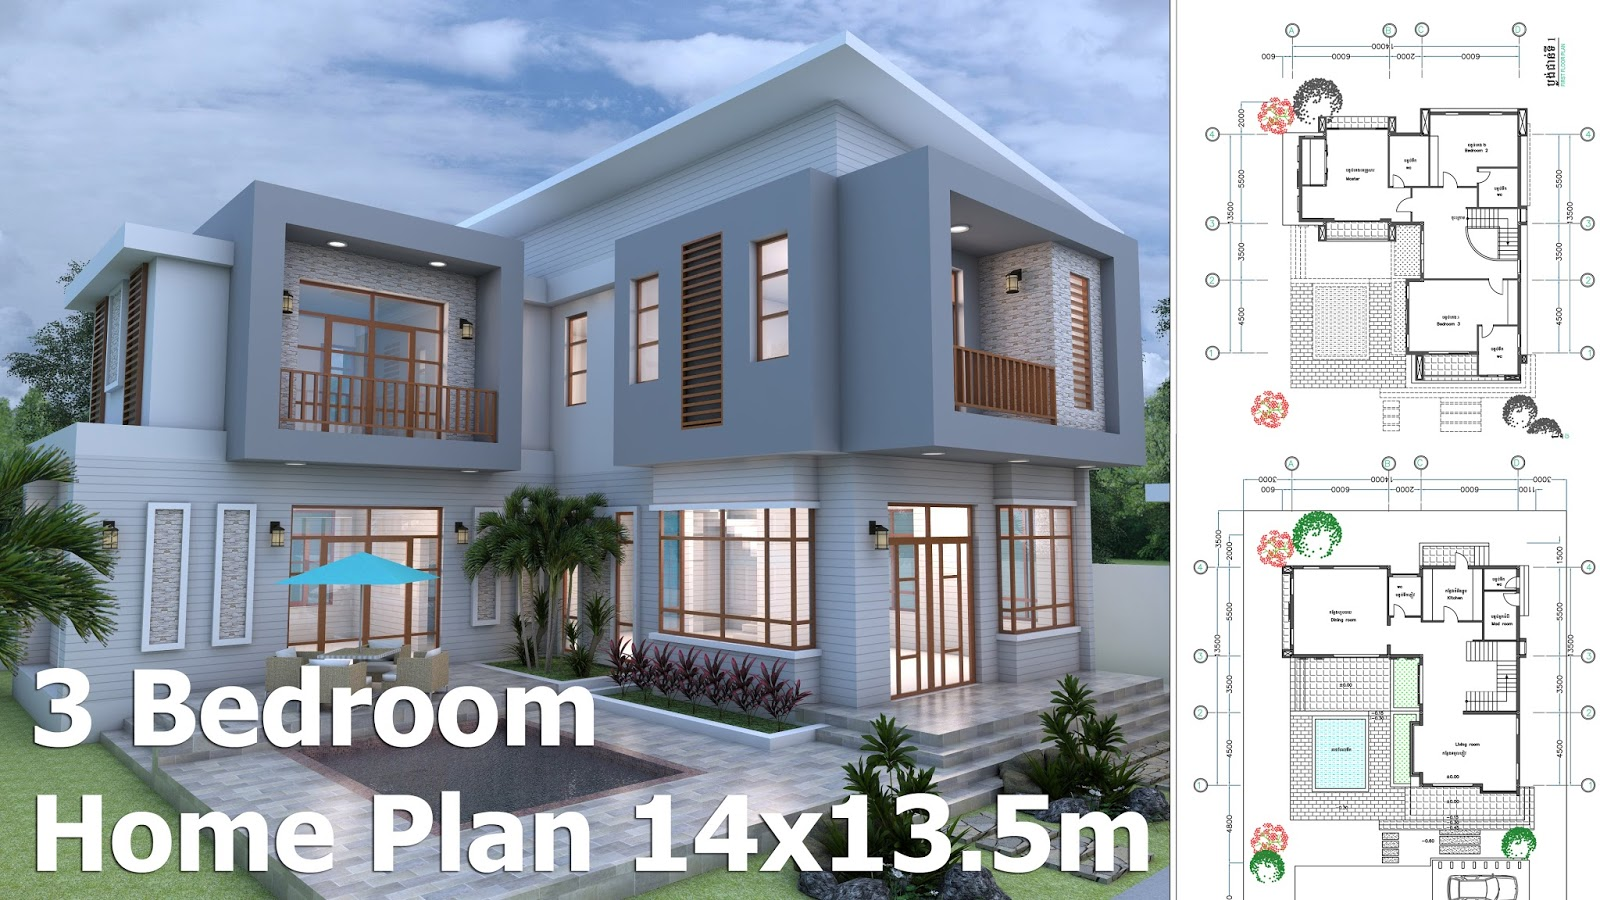 Marvelous SketchUp Modern Home Plan 14x13,5m